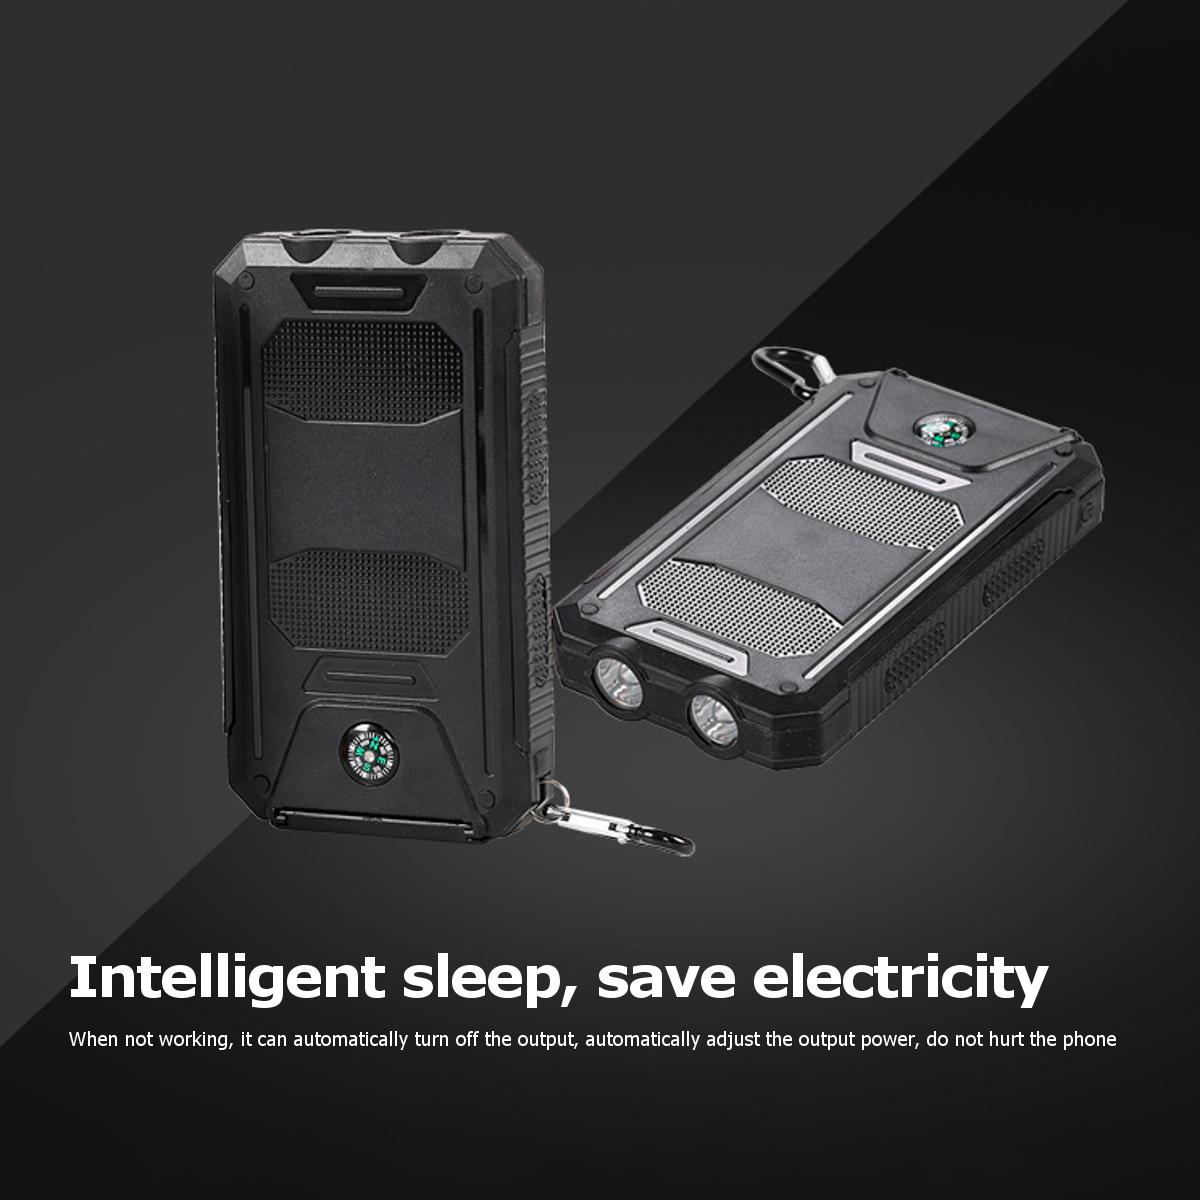 Bakeey LED Flashight 10000mAh Dual USB Солнечная Energy DIY Банк питания Батарея Чехол Для планшета мобильного телефона - фото 4